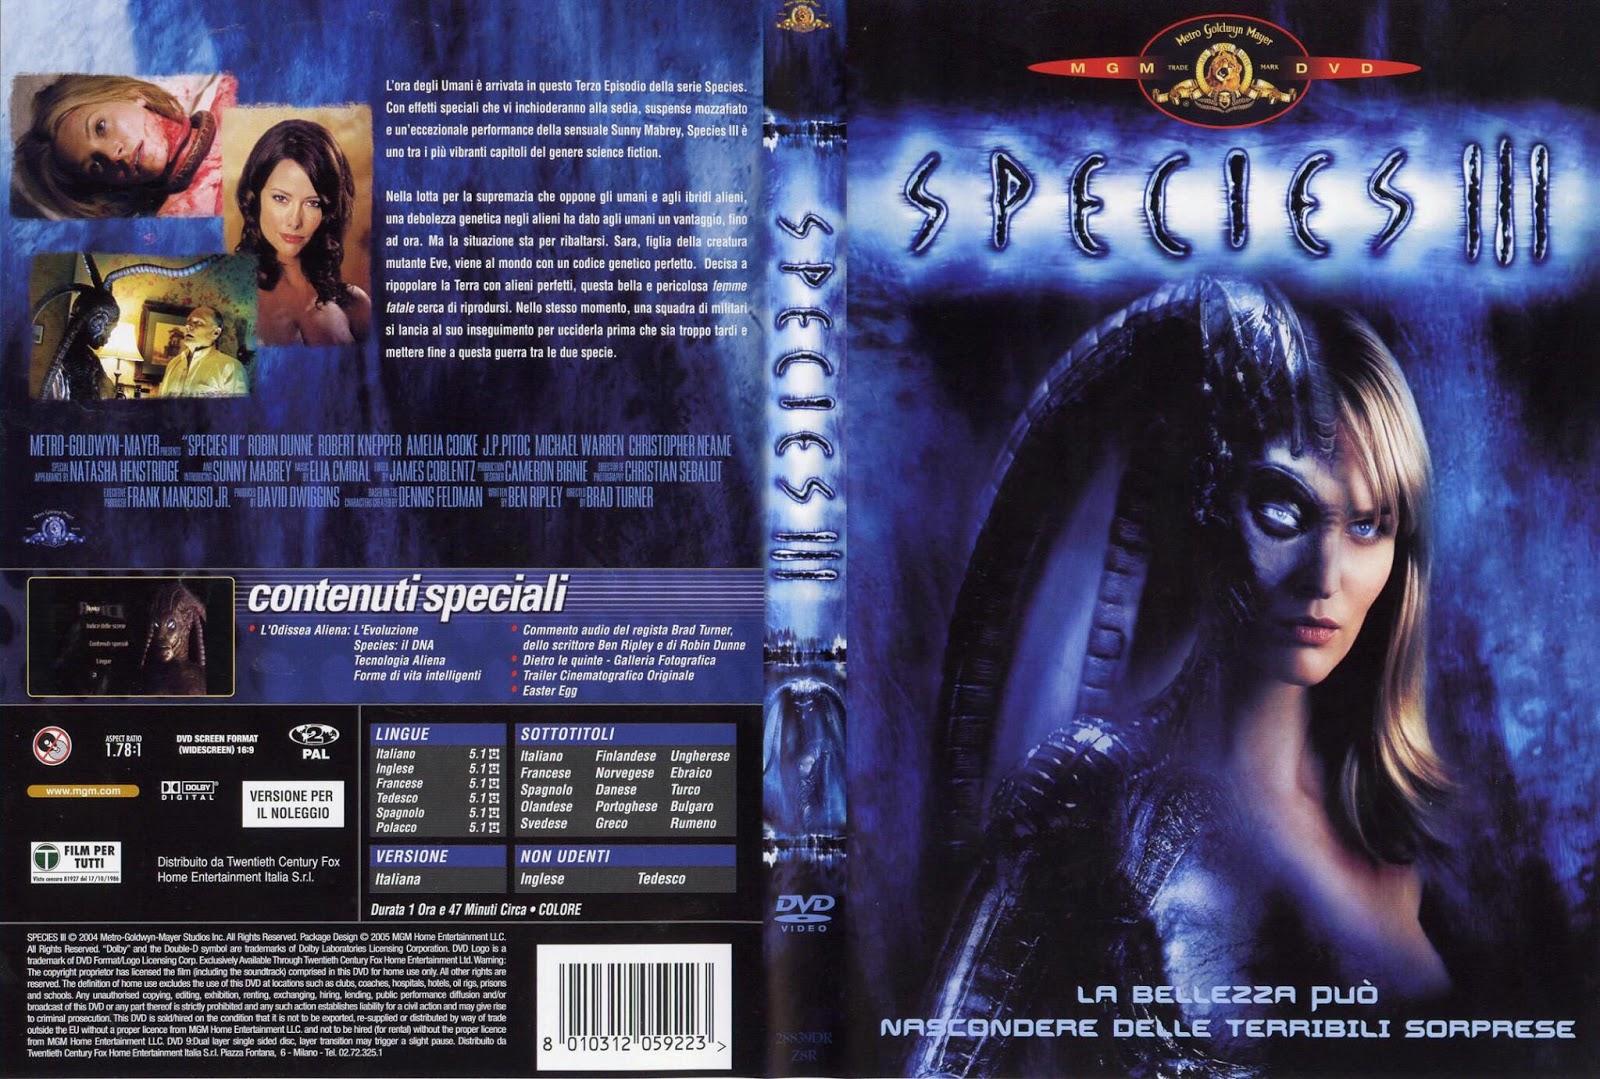 My Movie Review imdb copyright: Species III (Video 2004)